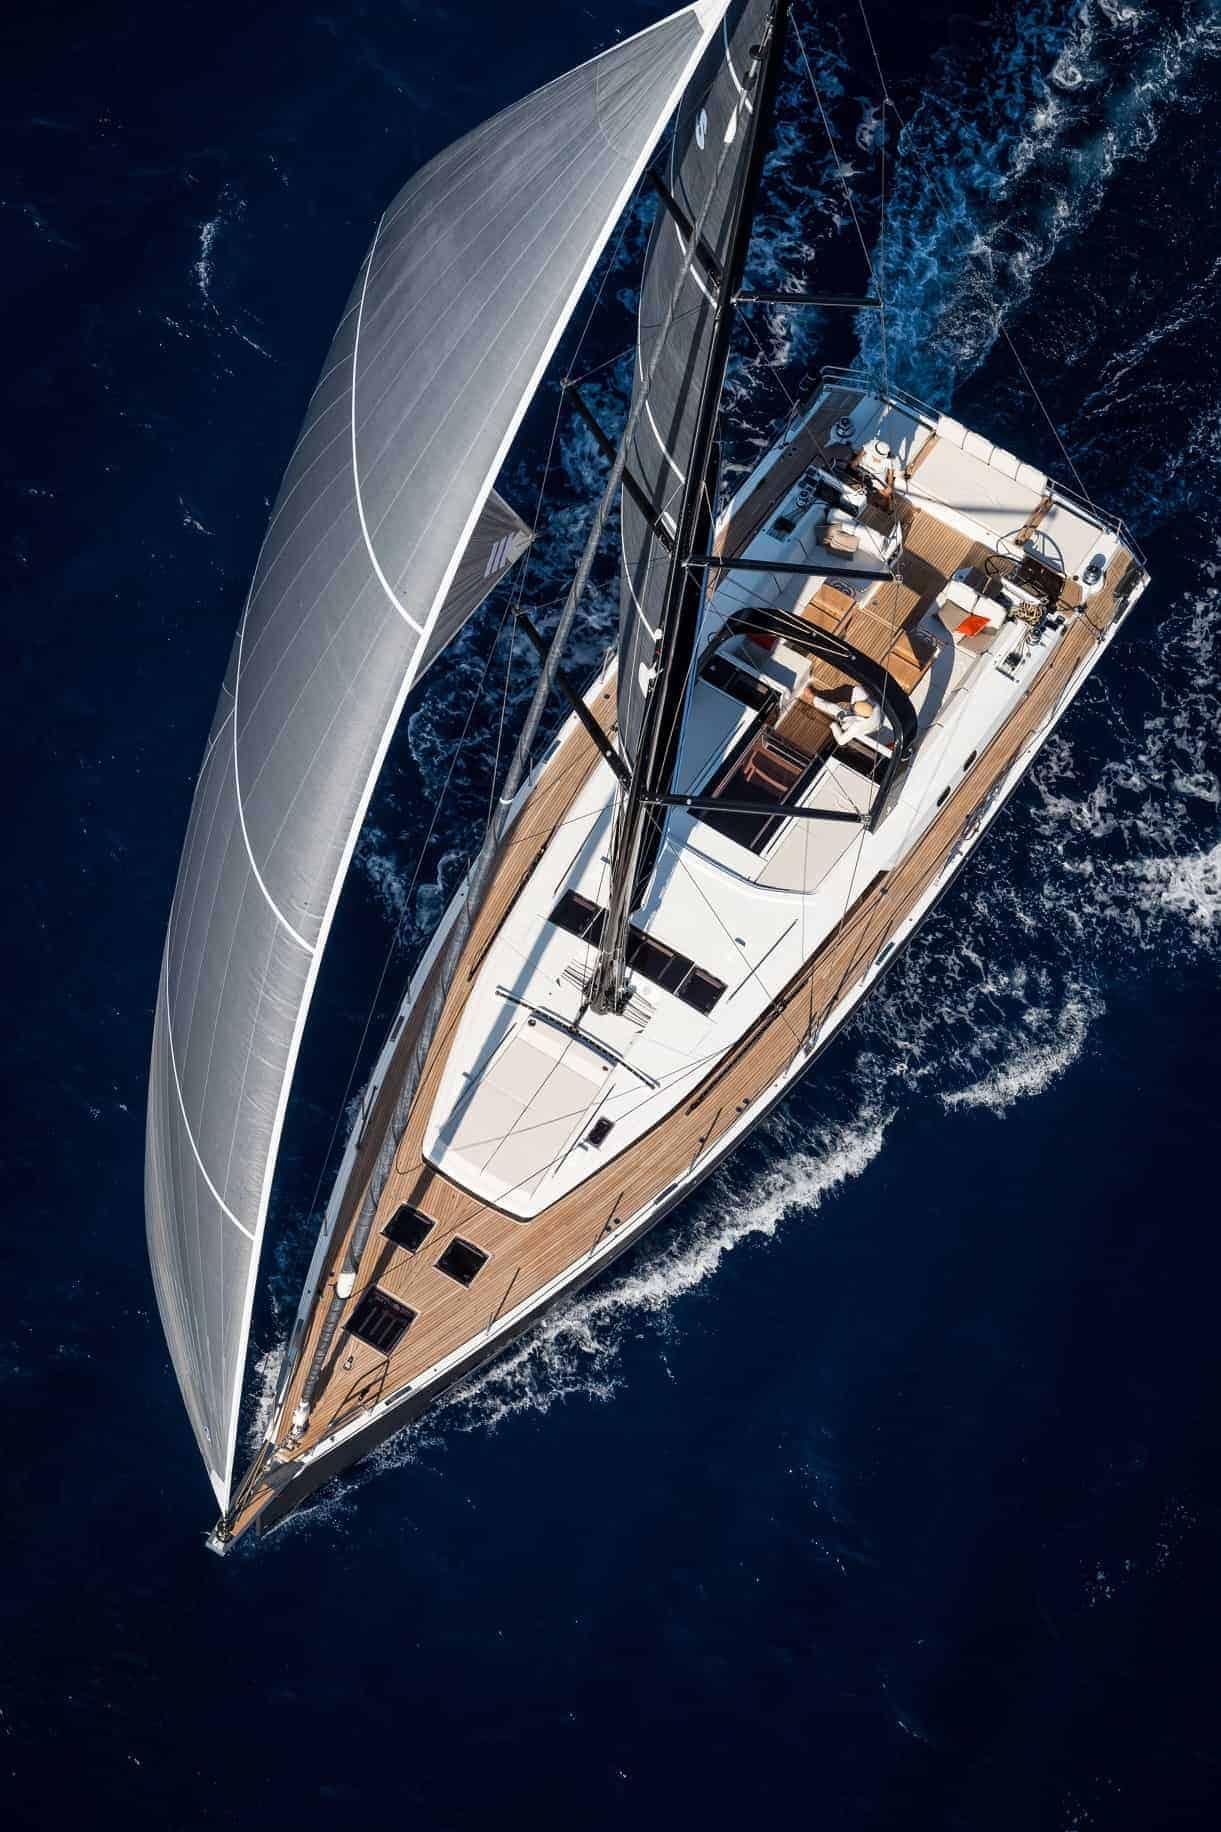 Beneteau Oceanis Yacht 62 gliding through emerald blue water